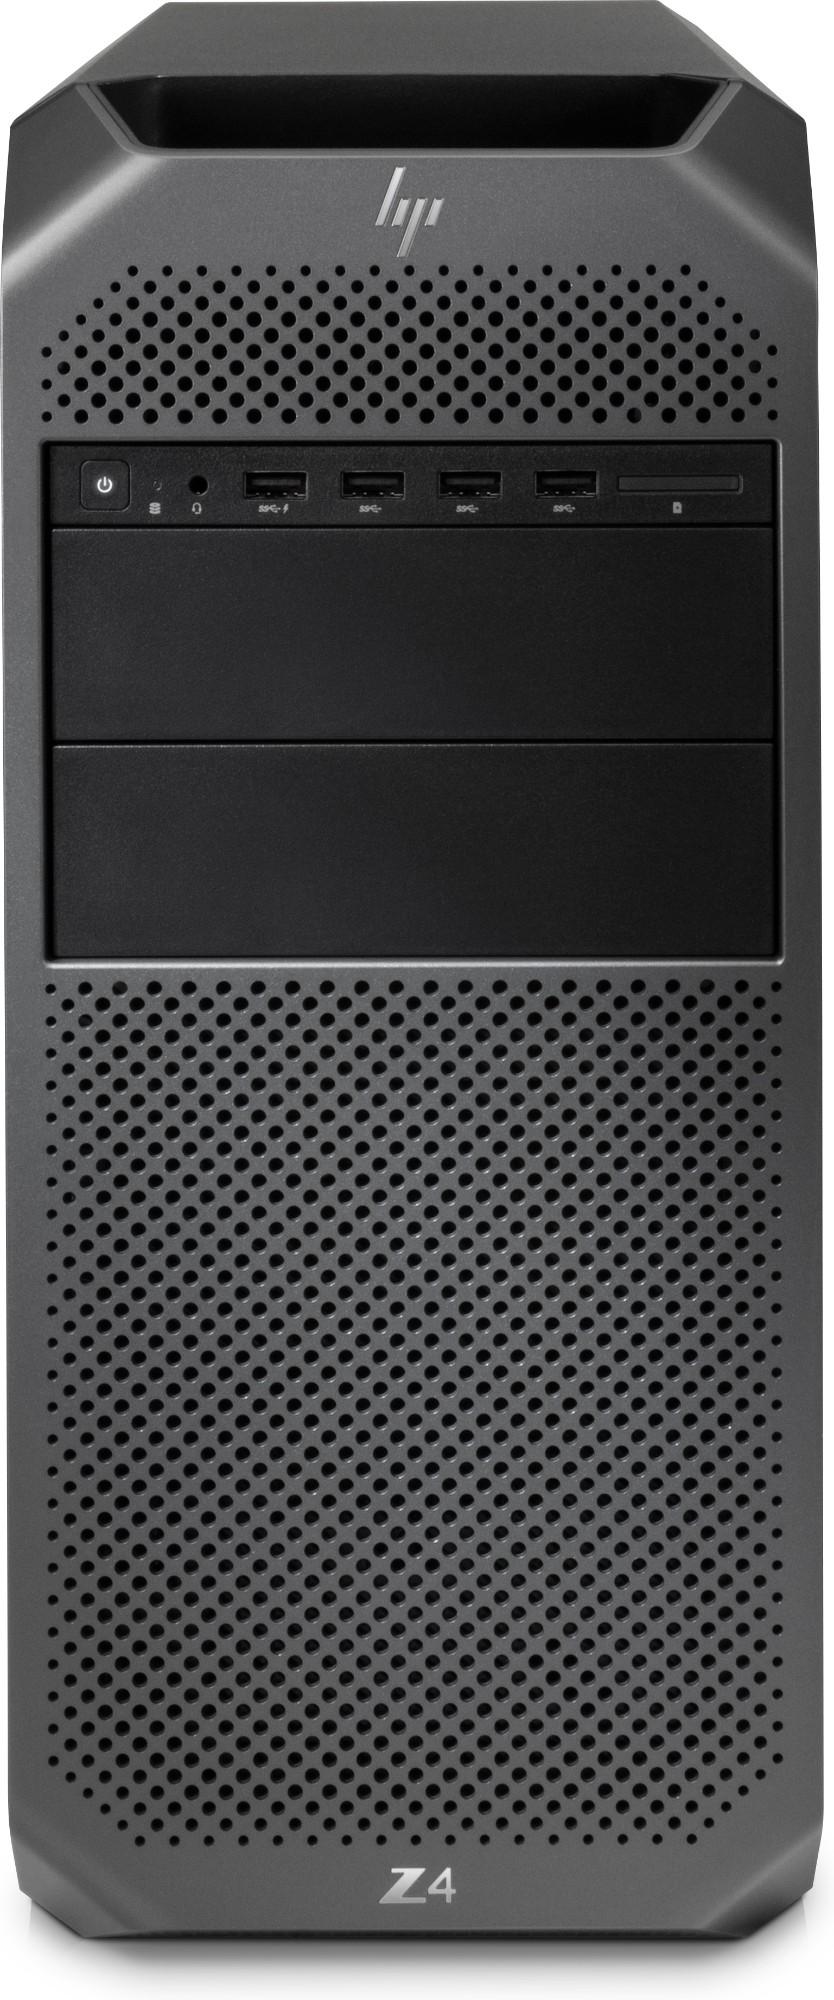 HP Z4 G4 MT 6QN64EA#ABU Xeon W-2123 16GB 1TB/256GB SSD DVDRW Win 10 Pro